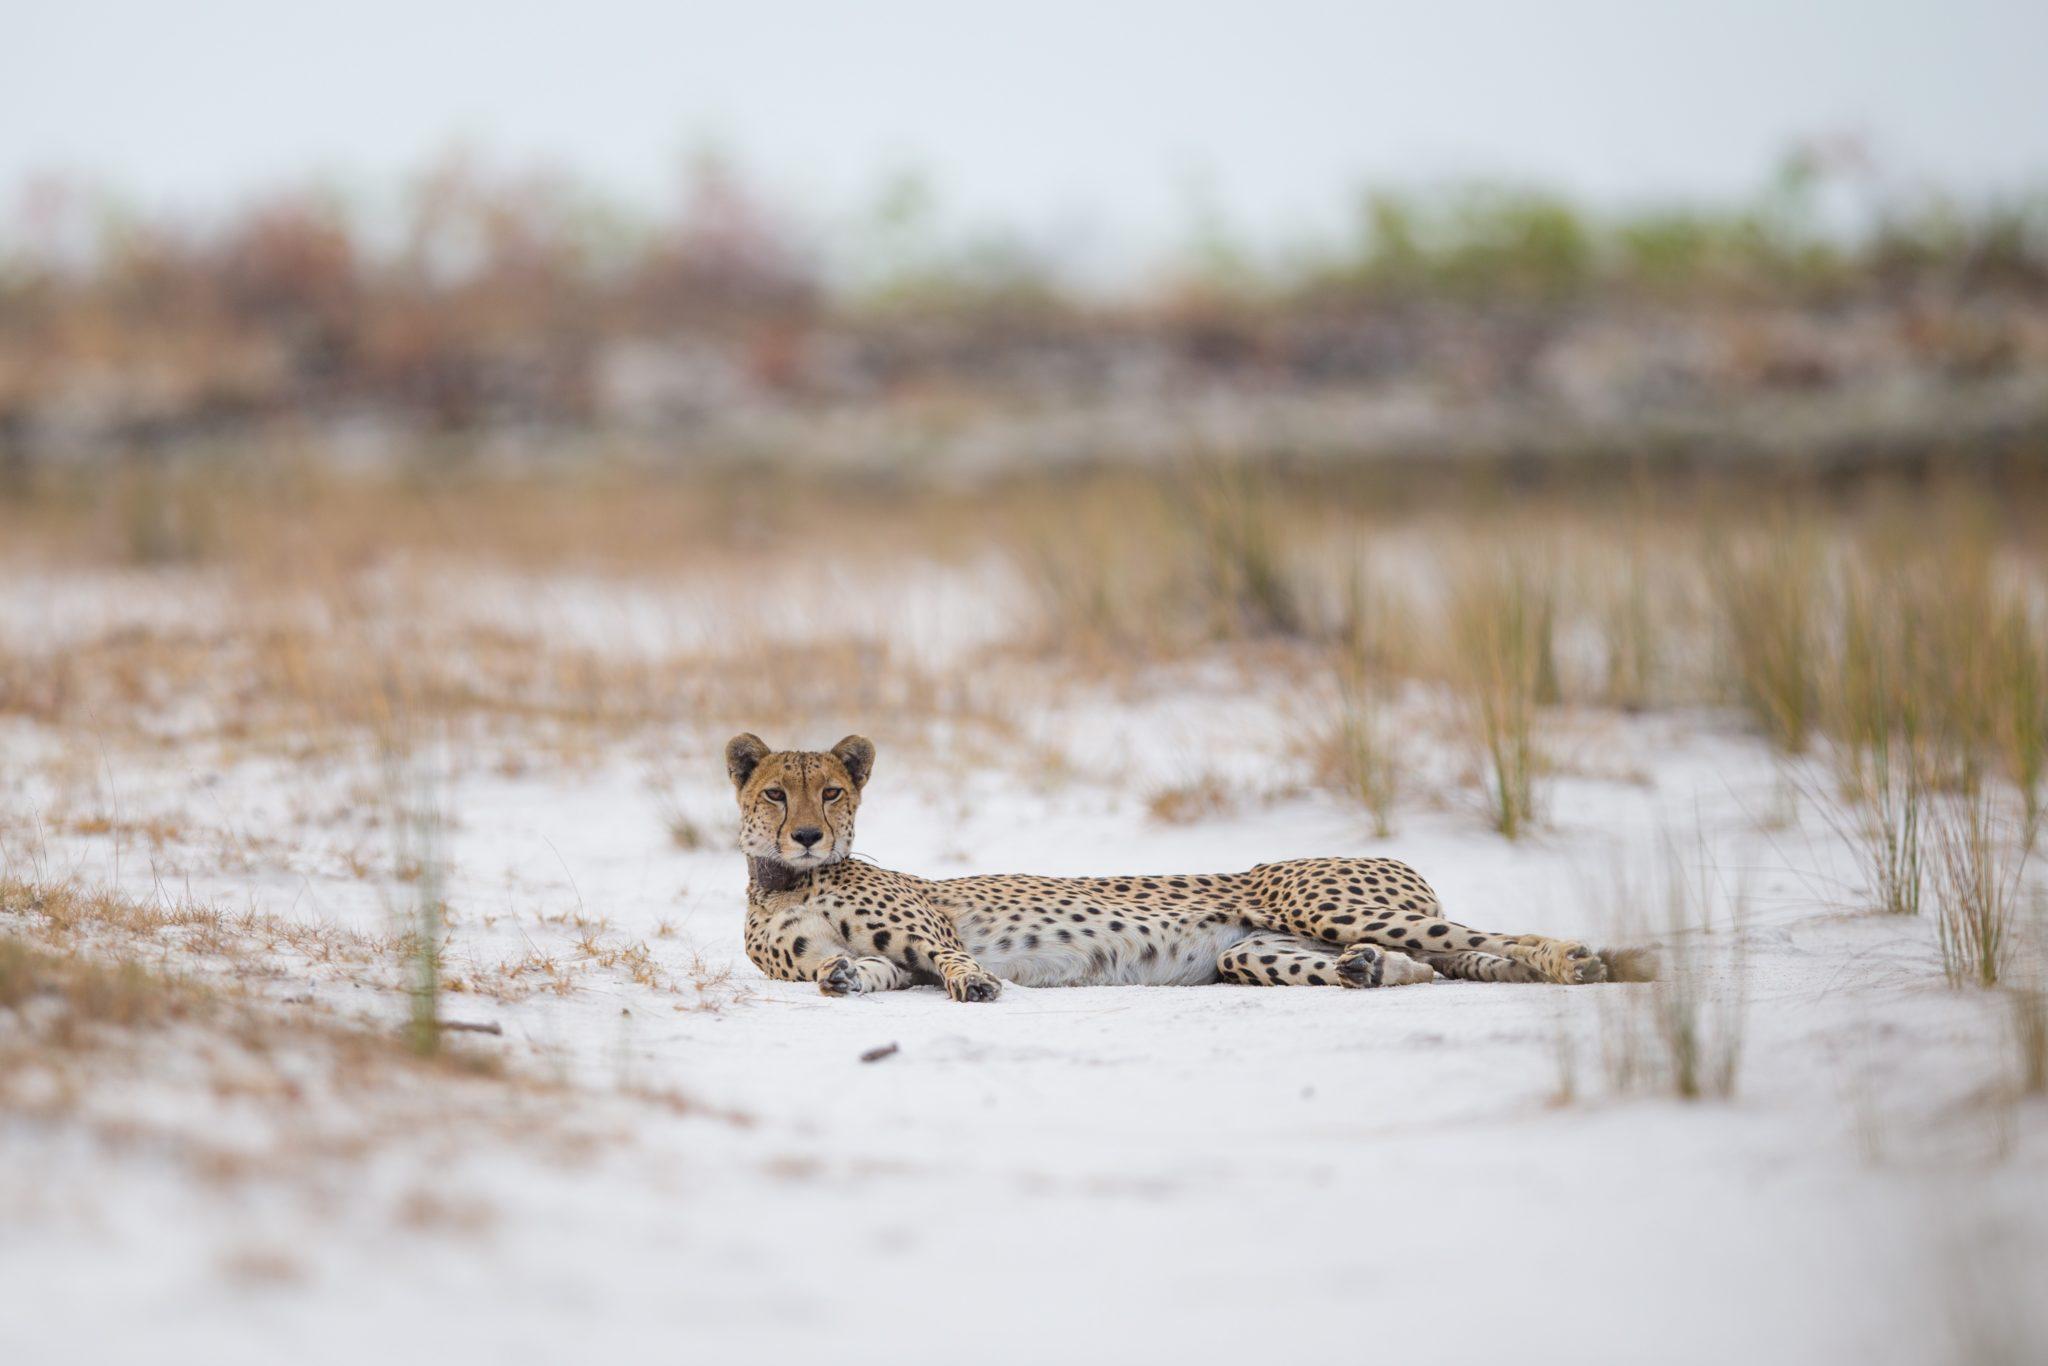 west zambia liuwa plains wildlife photography cheetah in road